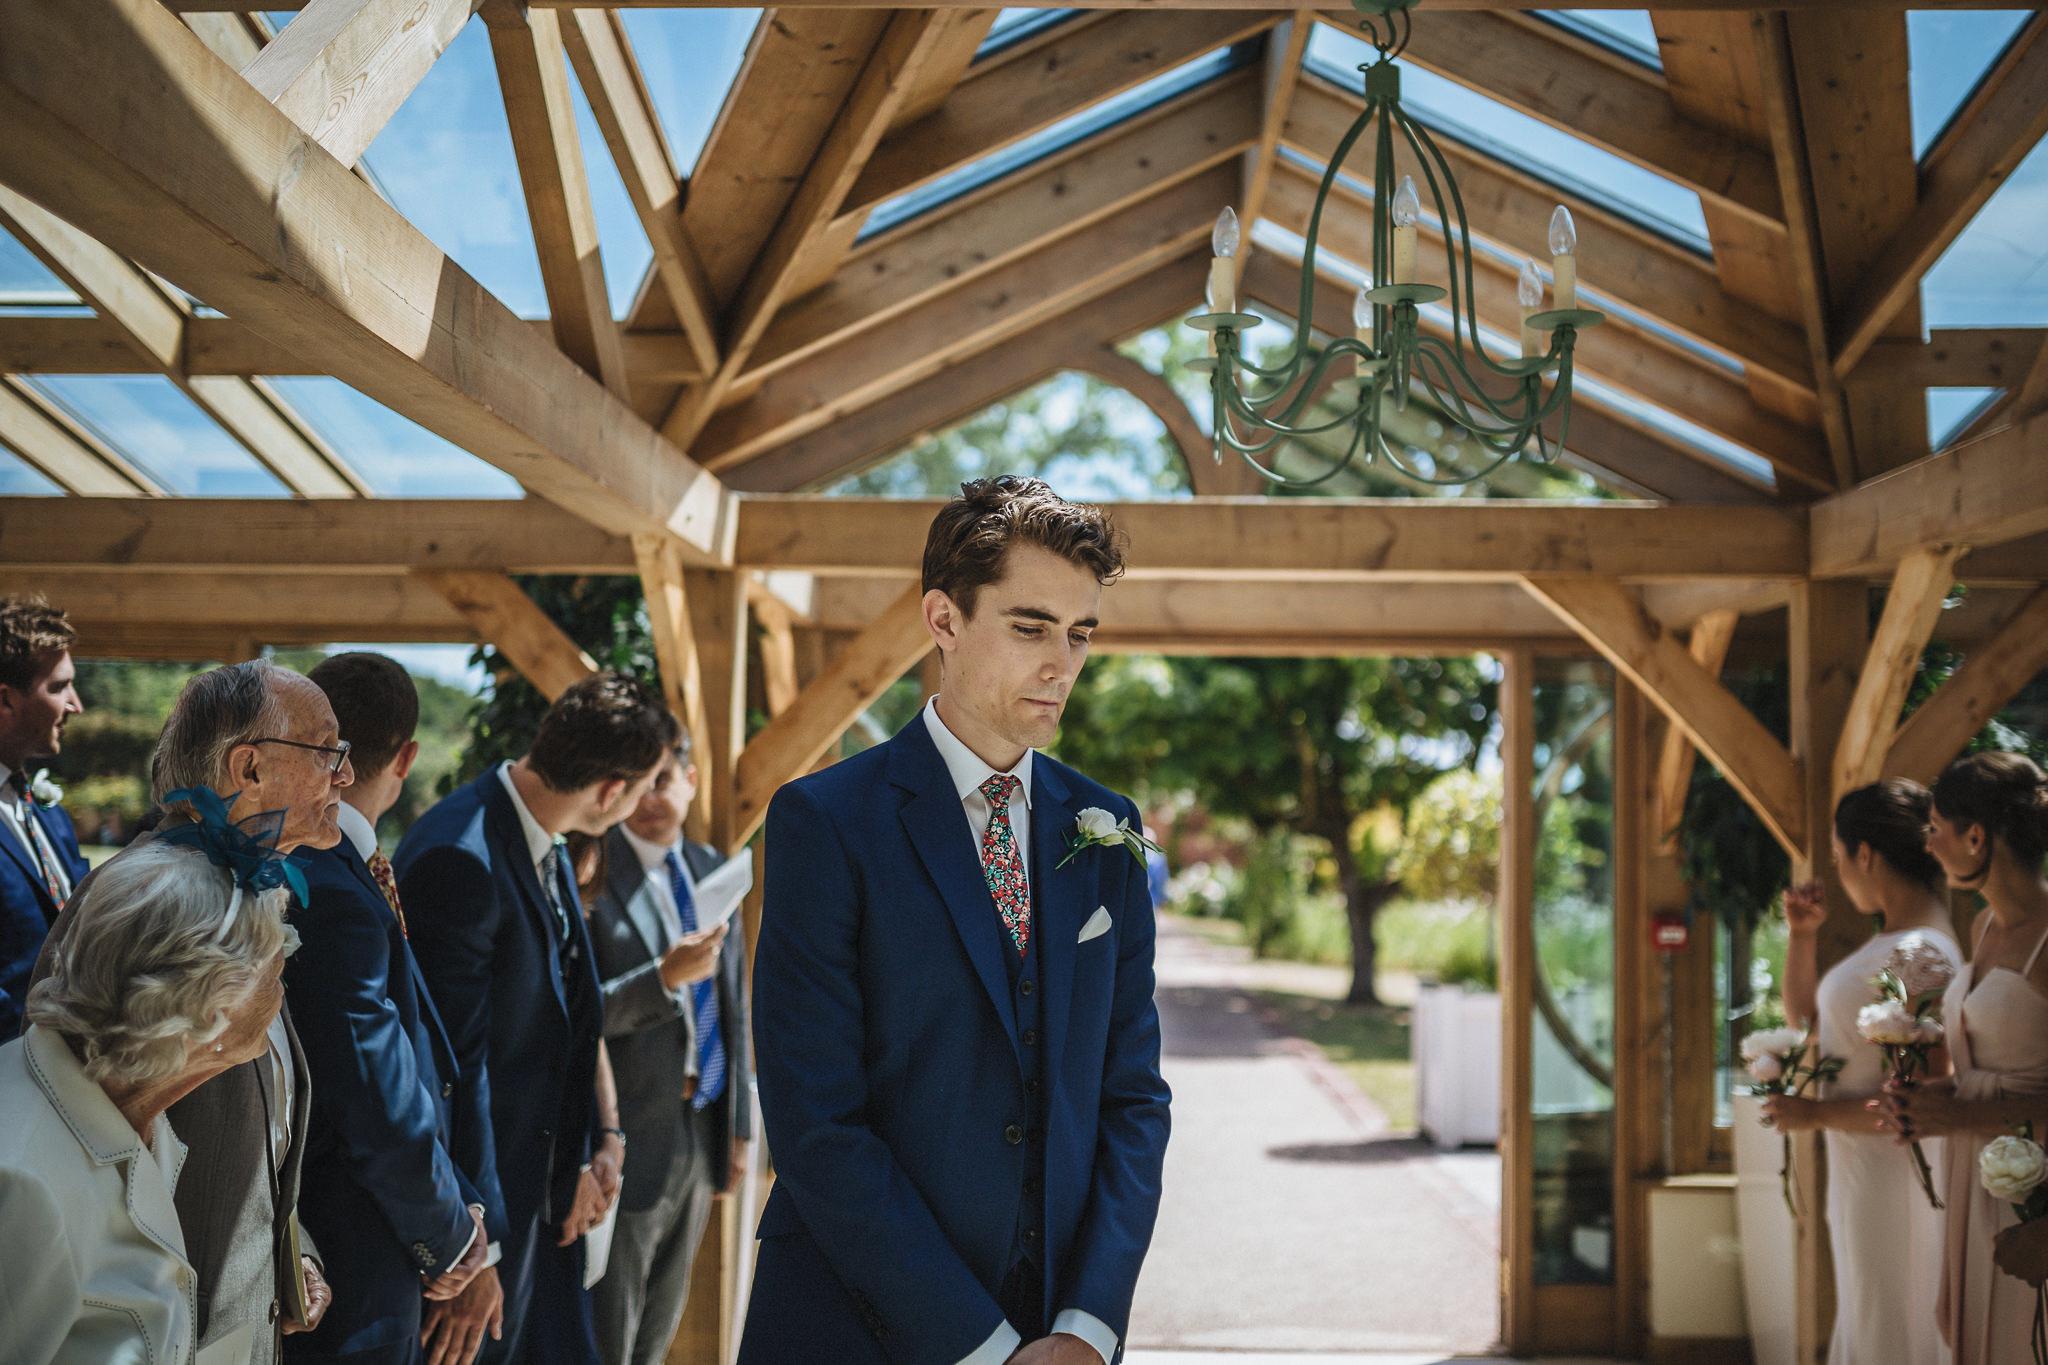 paul-marbrook-Gaynes-Park Wedding-Photographer-90043